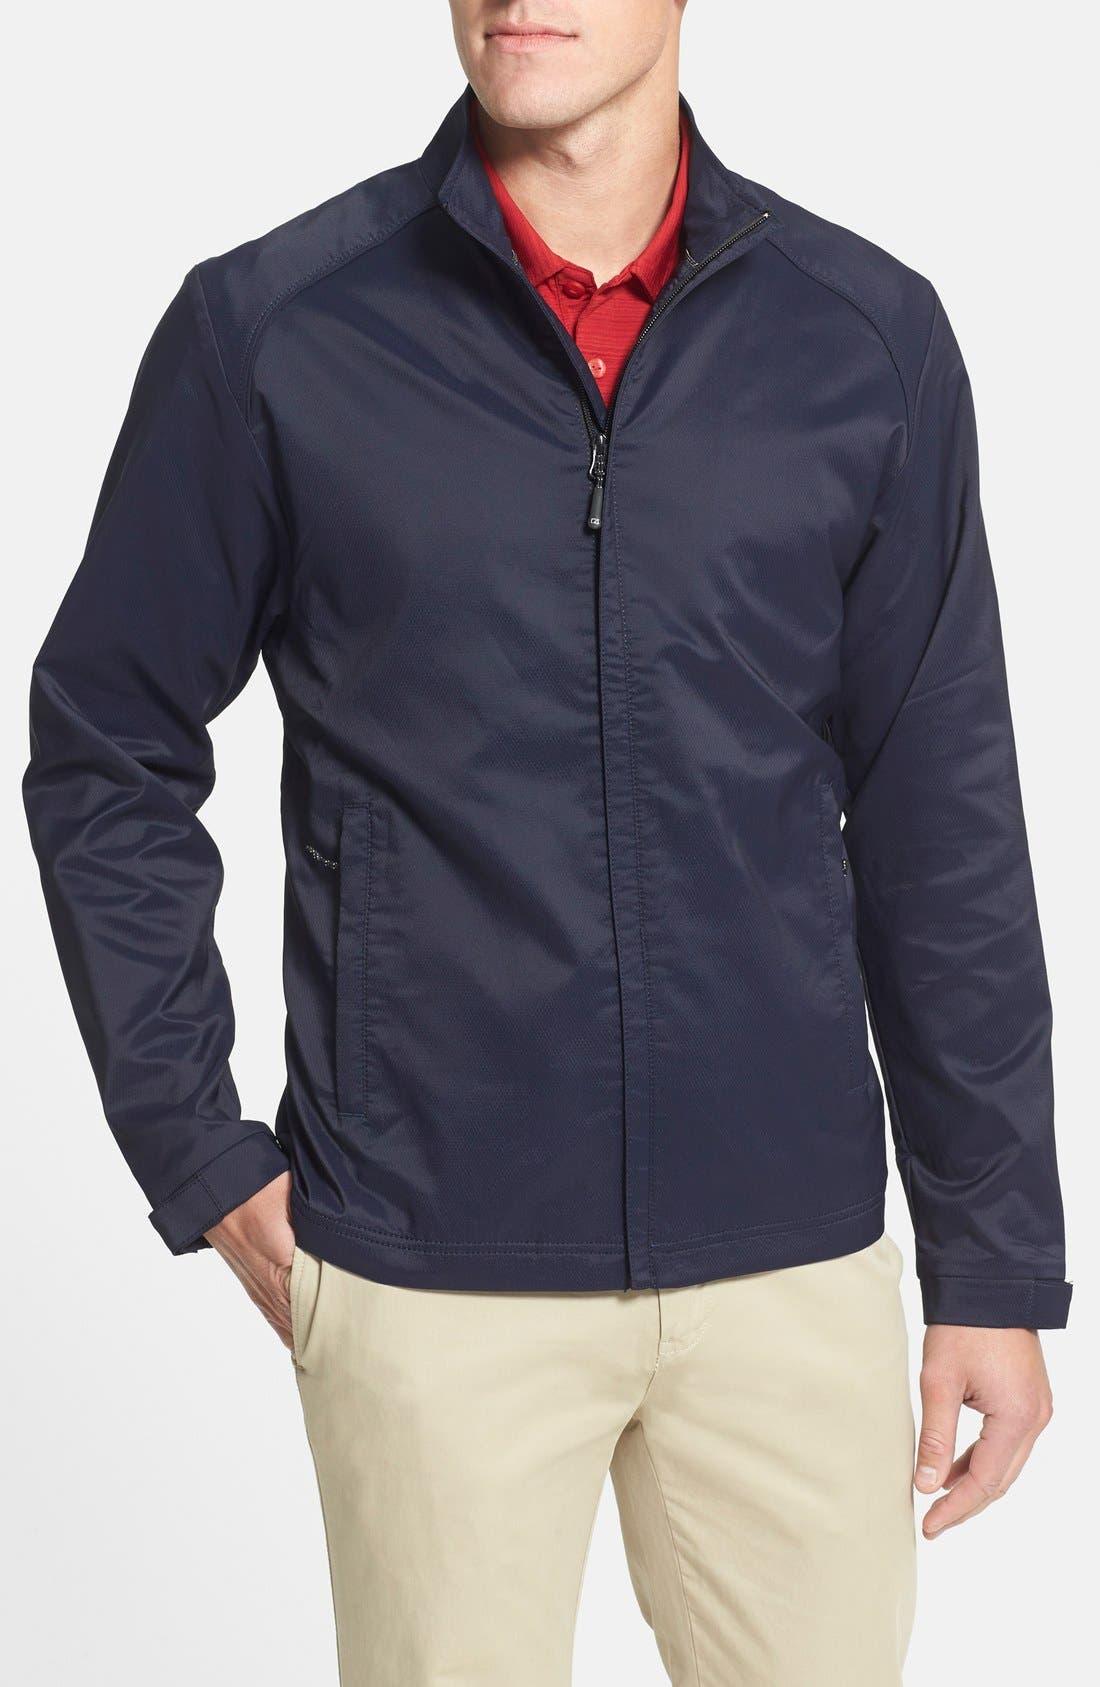 Blakely WeatherTec<sup>®</sup> Wind & Water Resistant Full Zip Jacket,                             Main thumbnail 1, color,                             LIBERTY NAVY